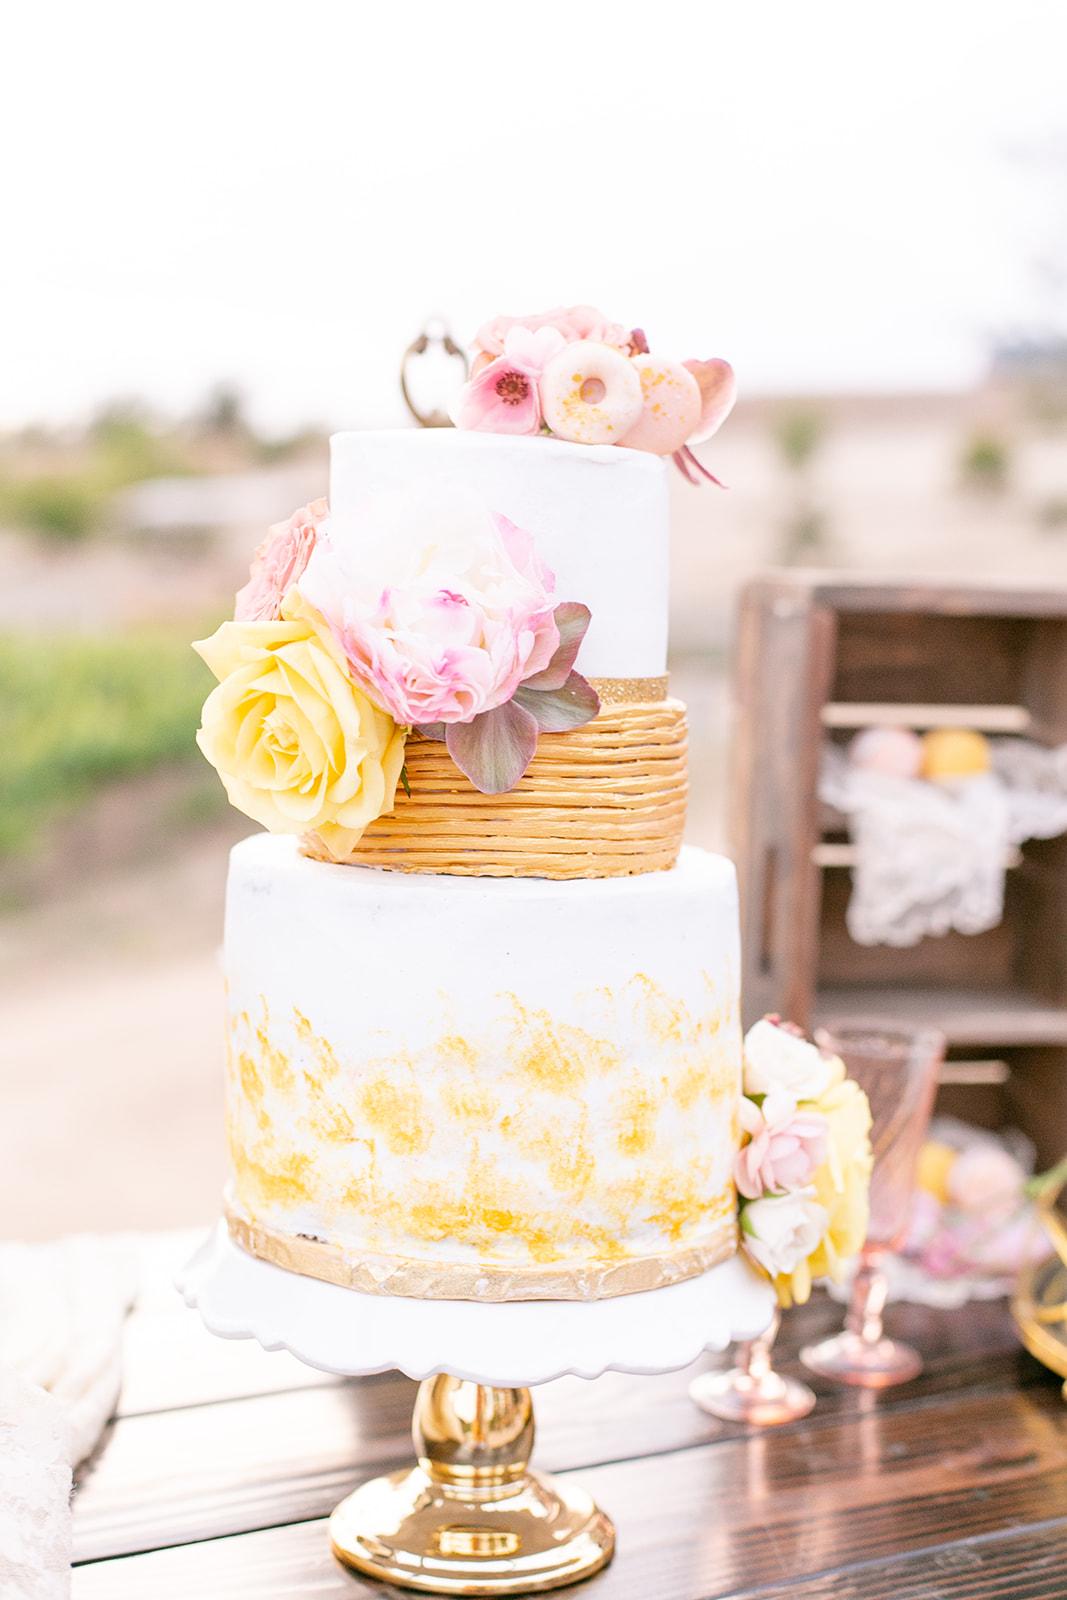 Cake Stand $5.00